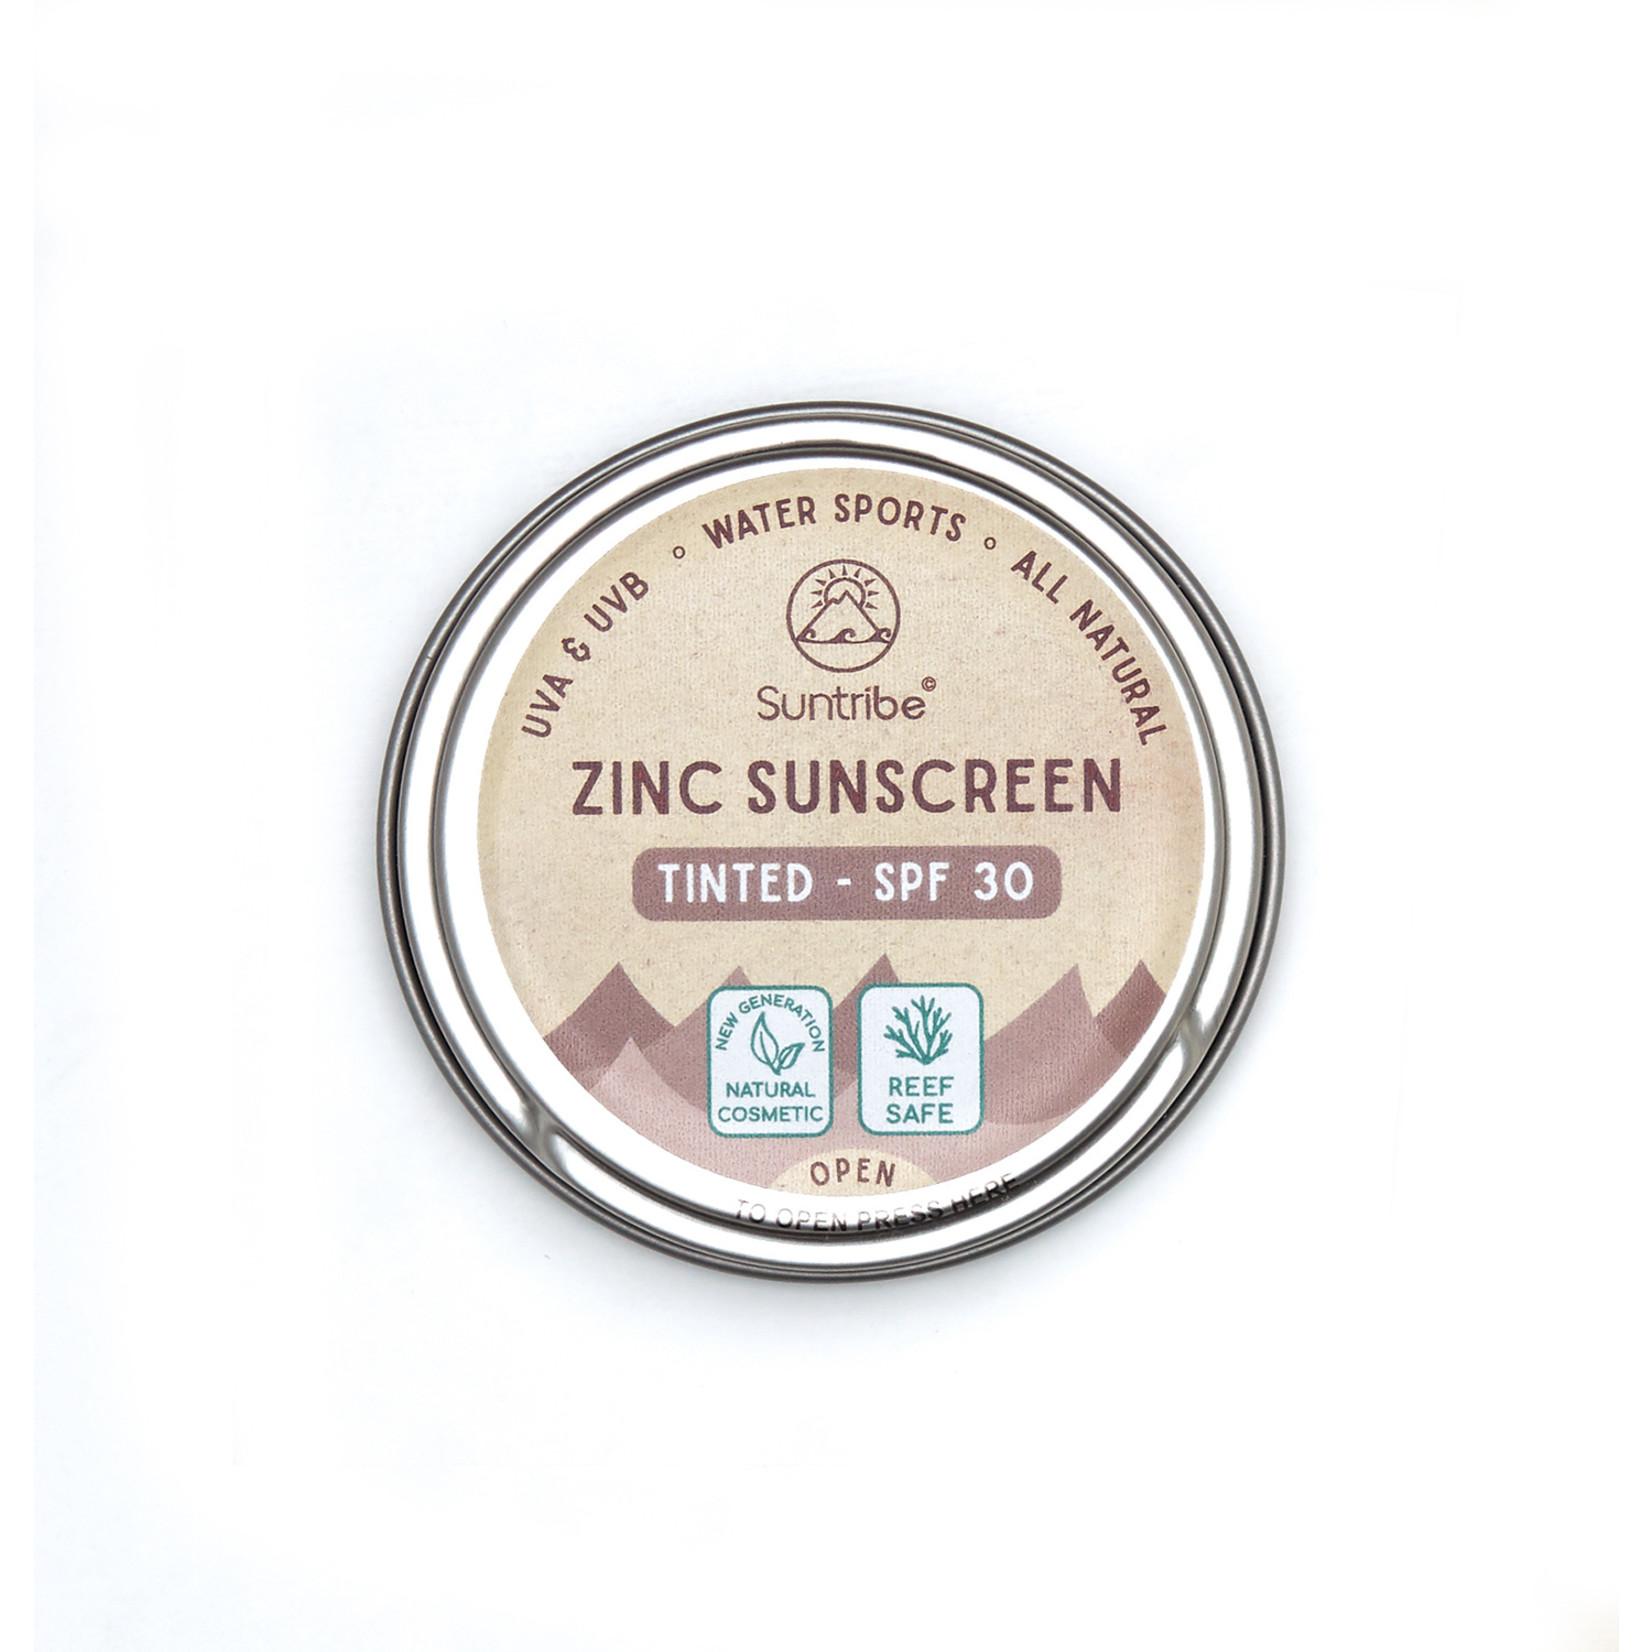 Suntribe Suntribe Zinc Sunscreen Tinted - Natural Mud Tint - SPF30